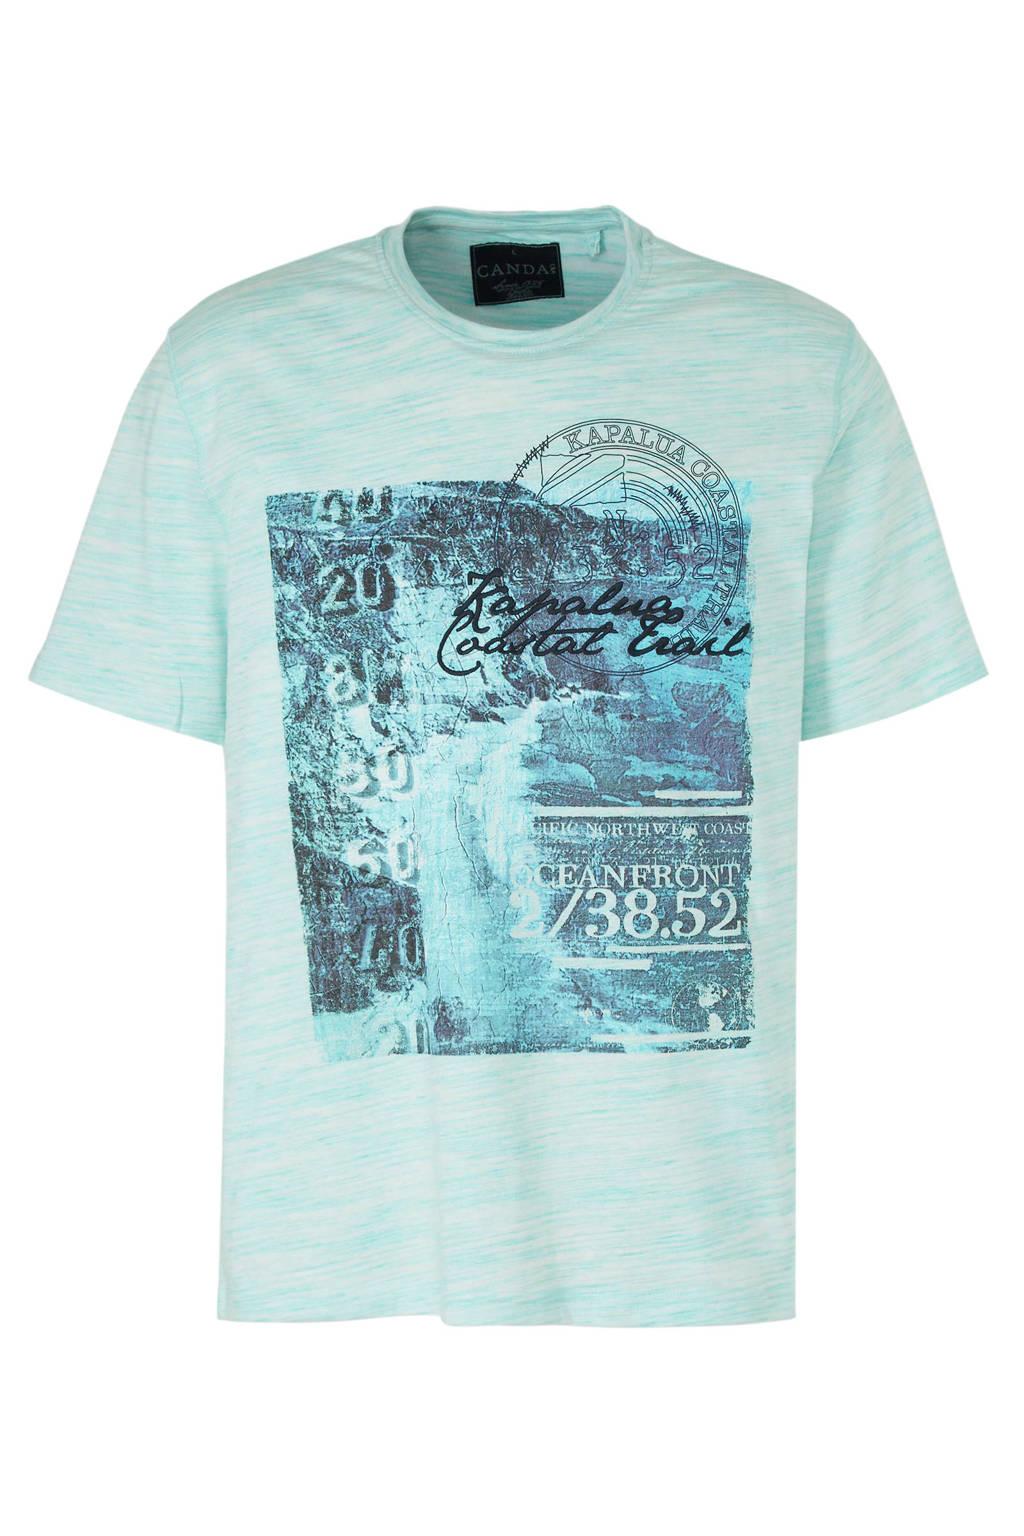 C&A Canda T-shirt met printopdruk, lichtbauw